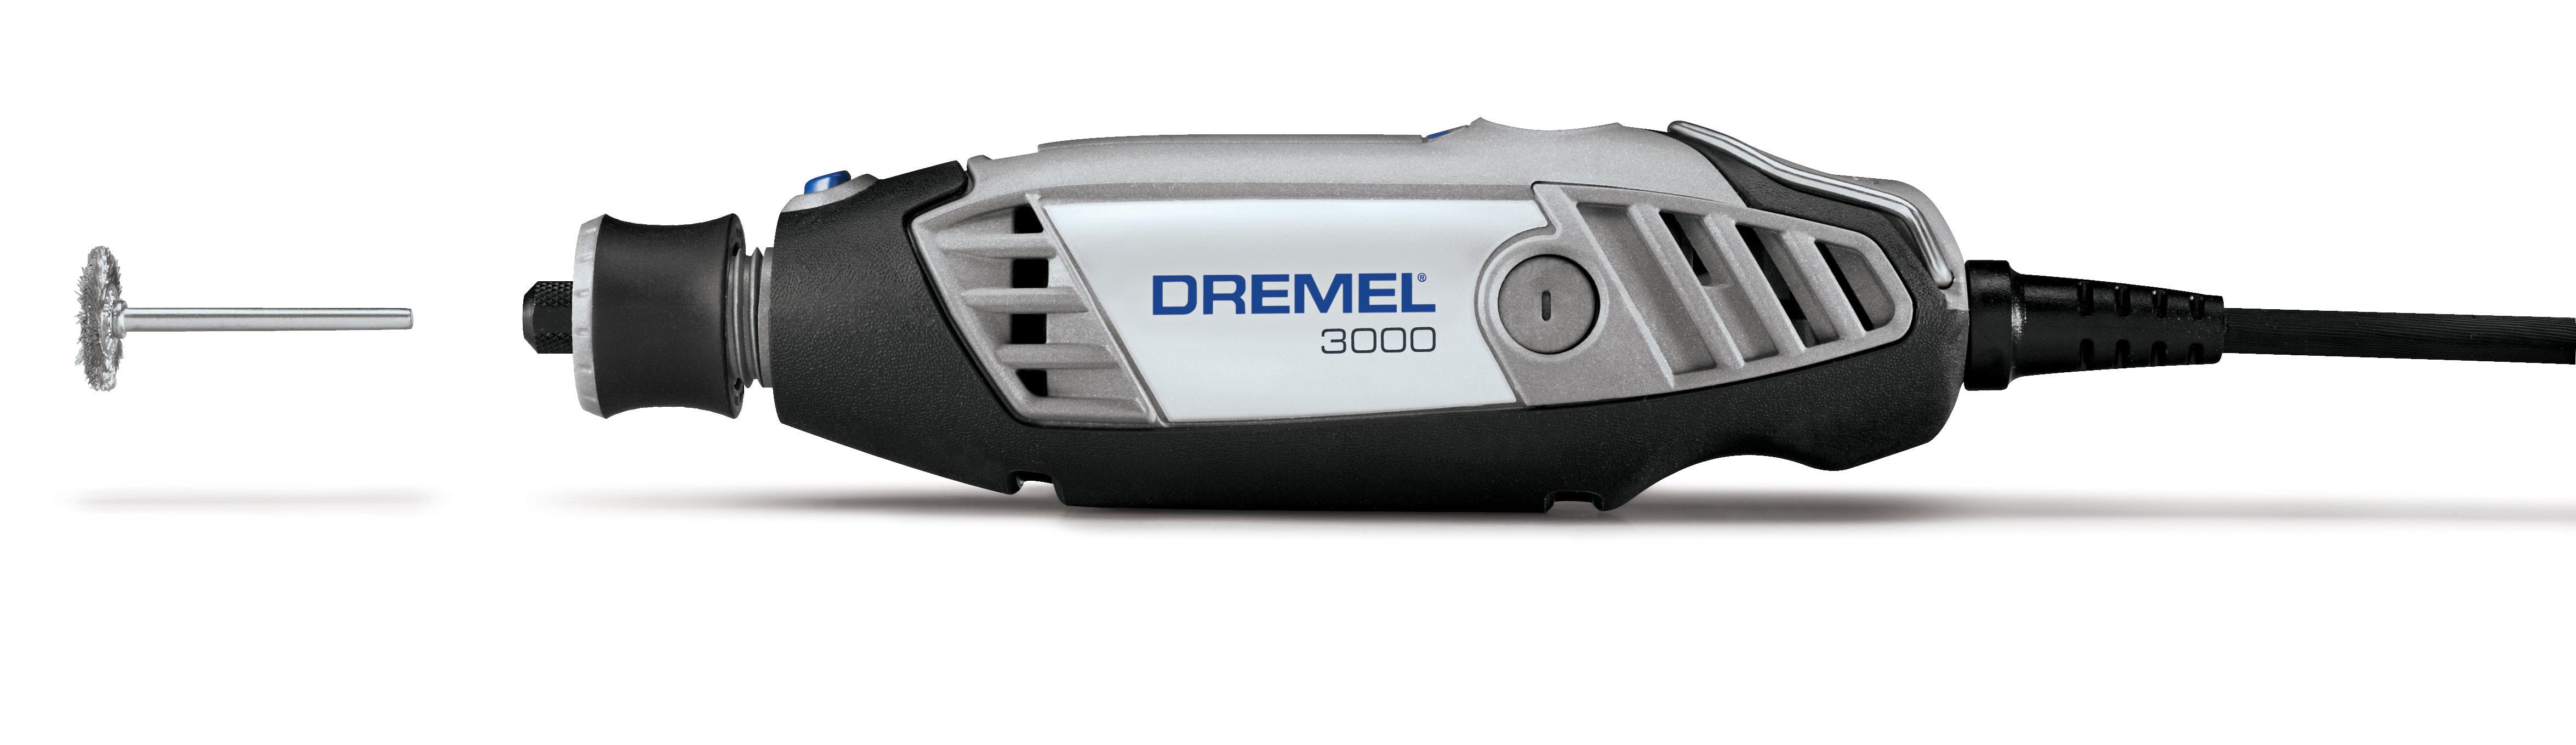 dremel 3000 1 24 variable speed tool kit ad 4862389 addoway. Black Bedroom Furniture Sets. Home Design Ideas